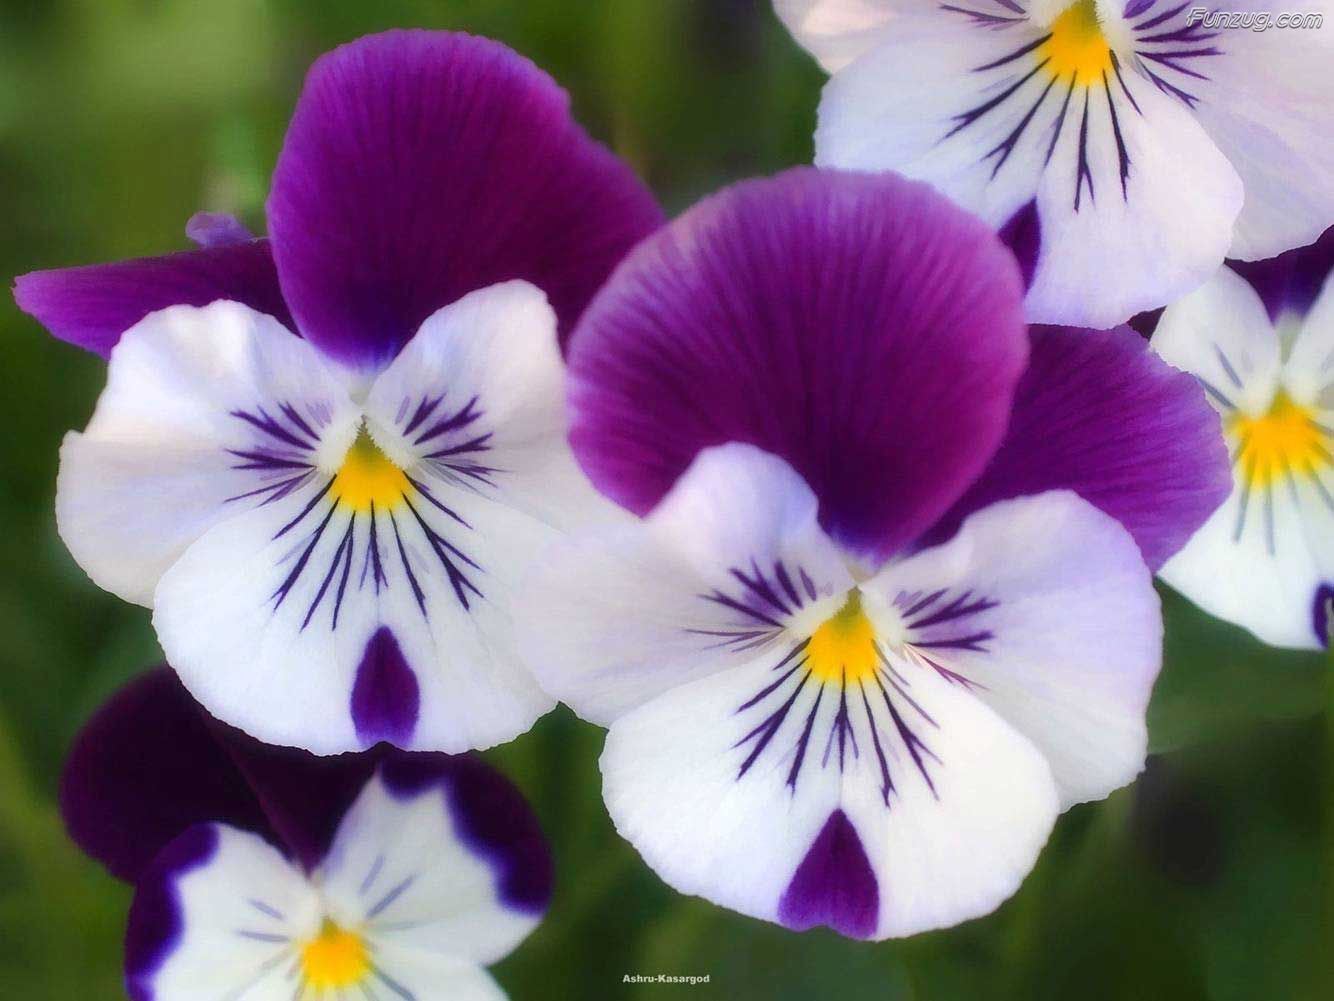 Maprox HD: 20 Beautiful Flowers Wallpapers